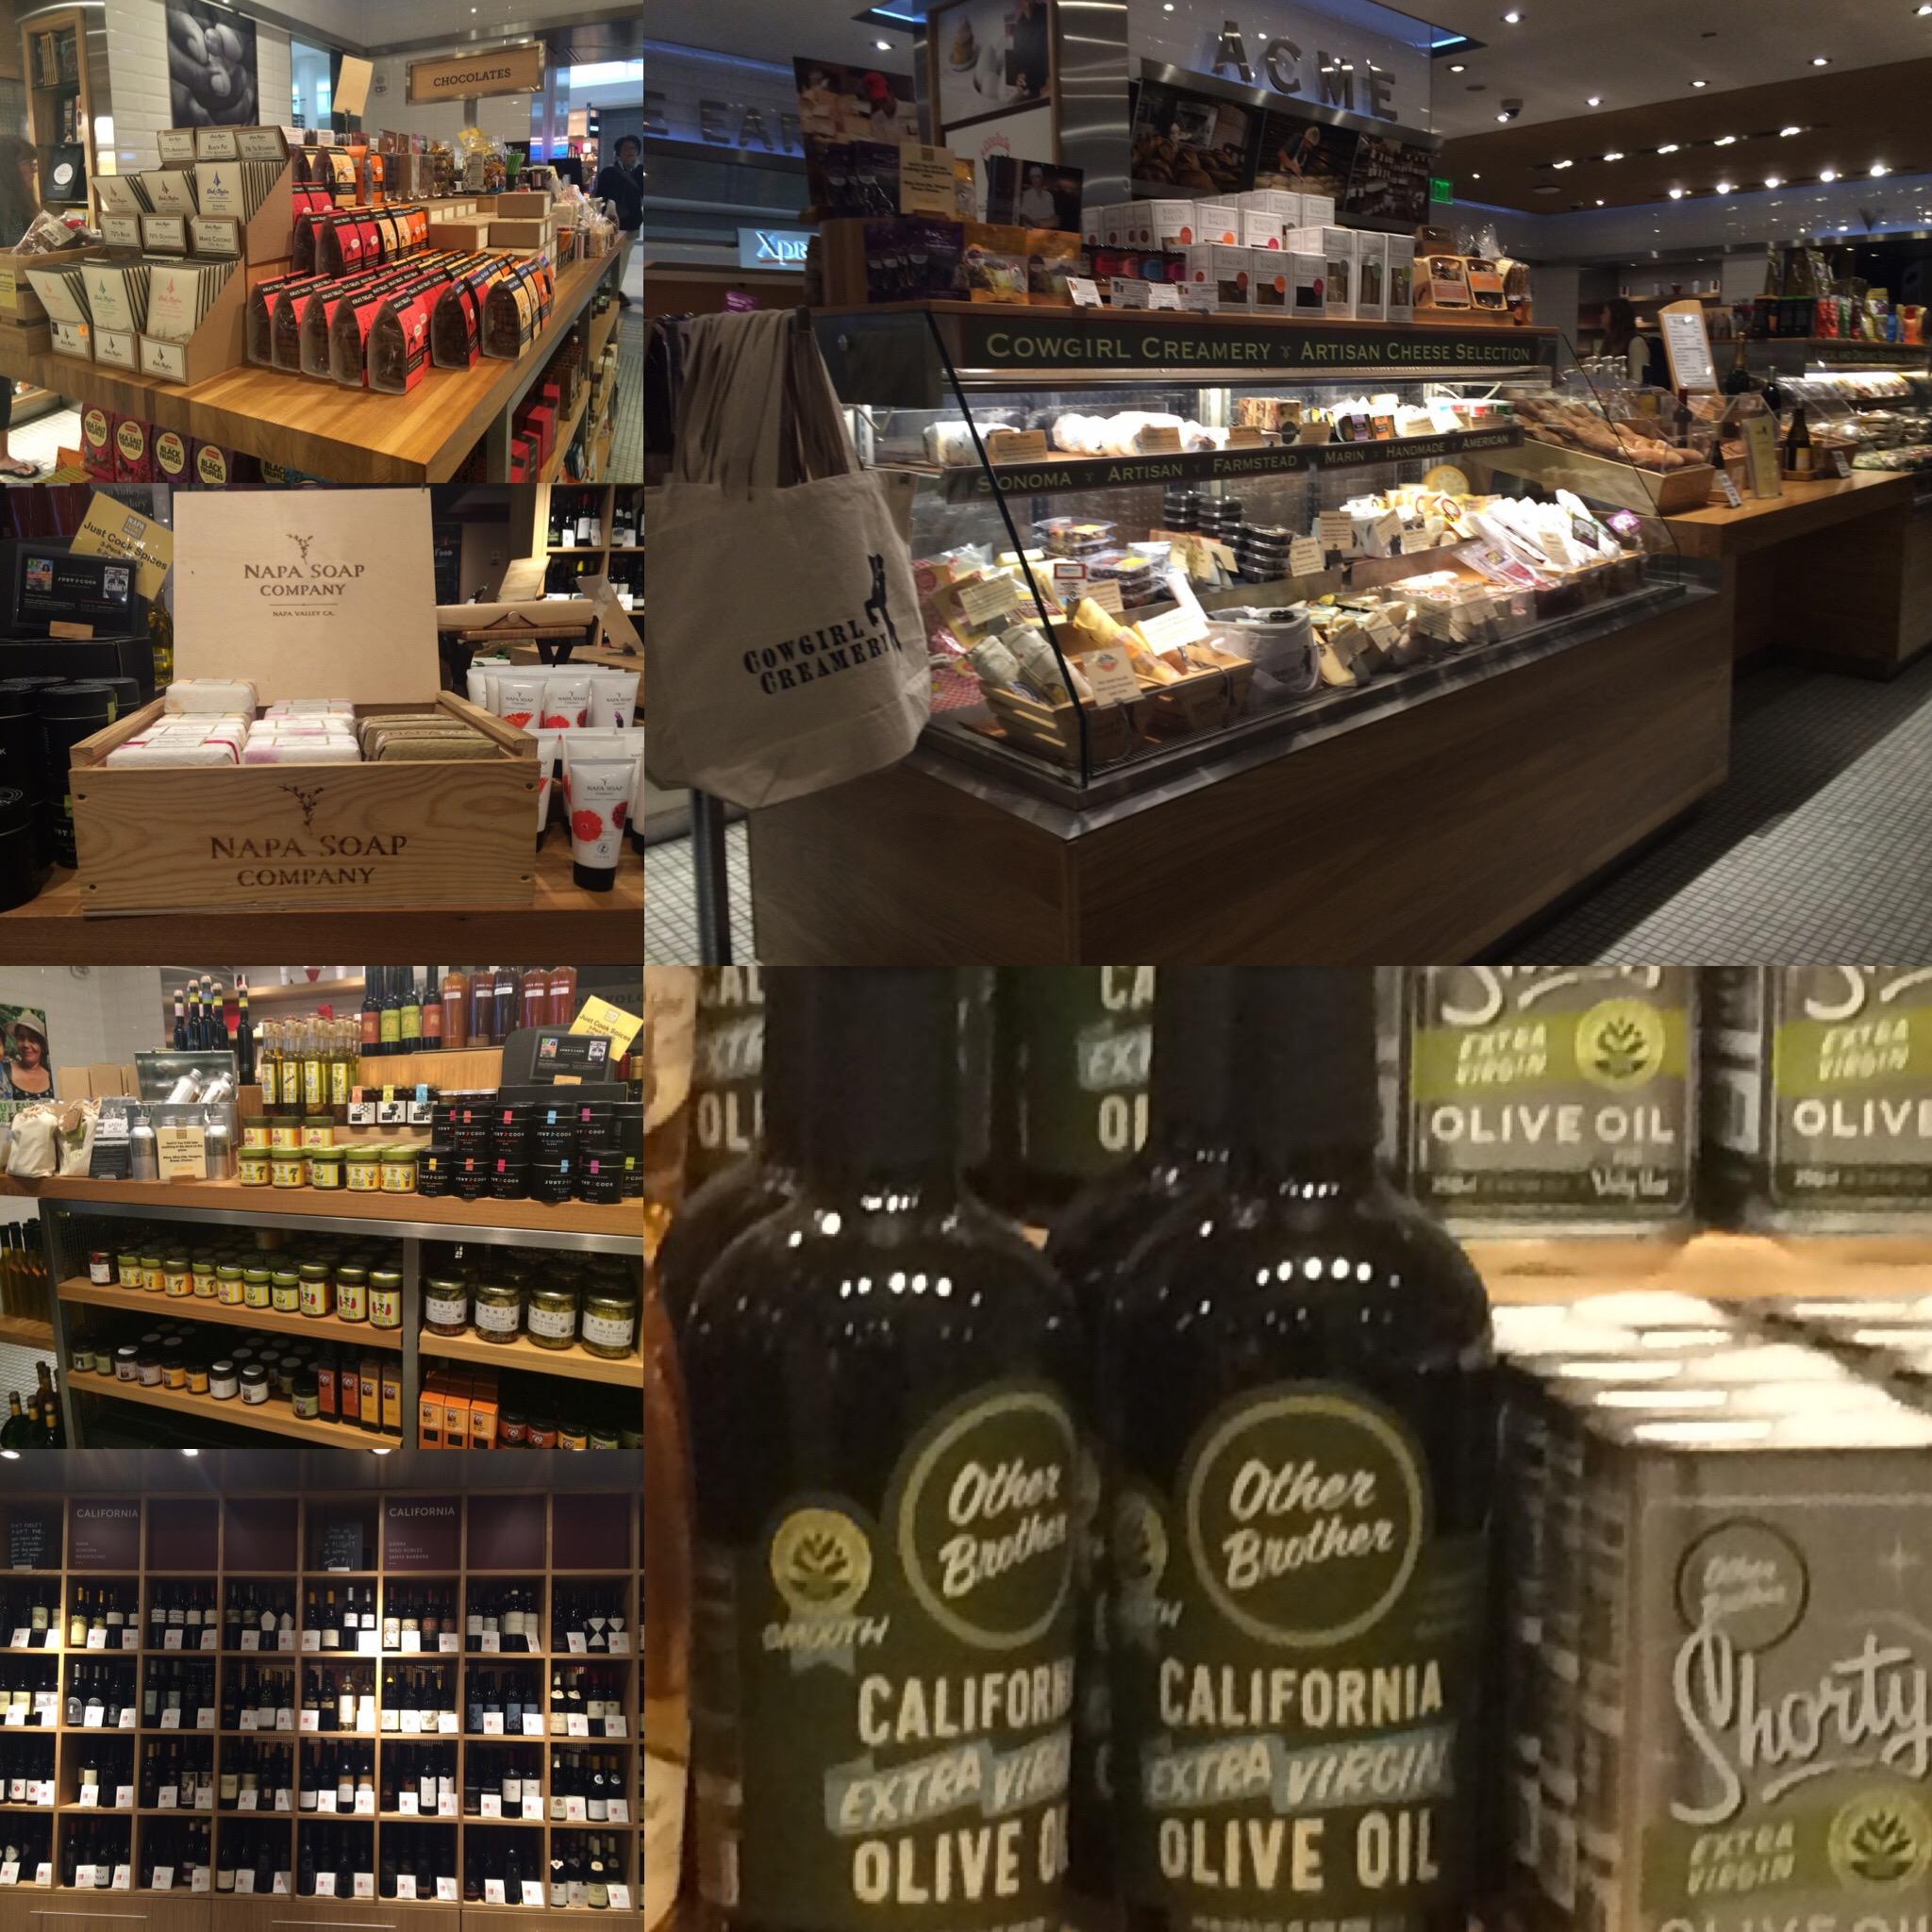 Fine wines, gourmet chocolates and cheeses at the Napa Farms Market at SFO